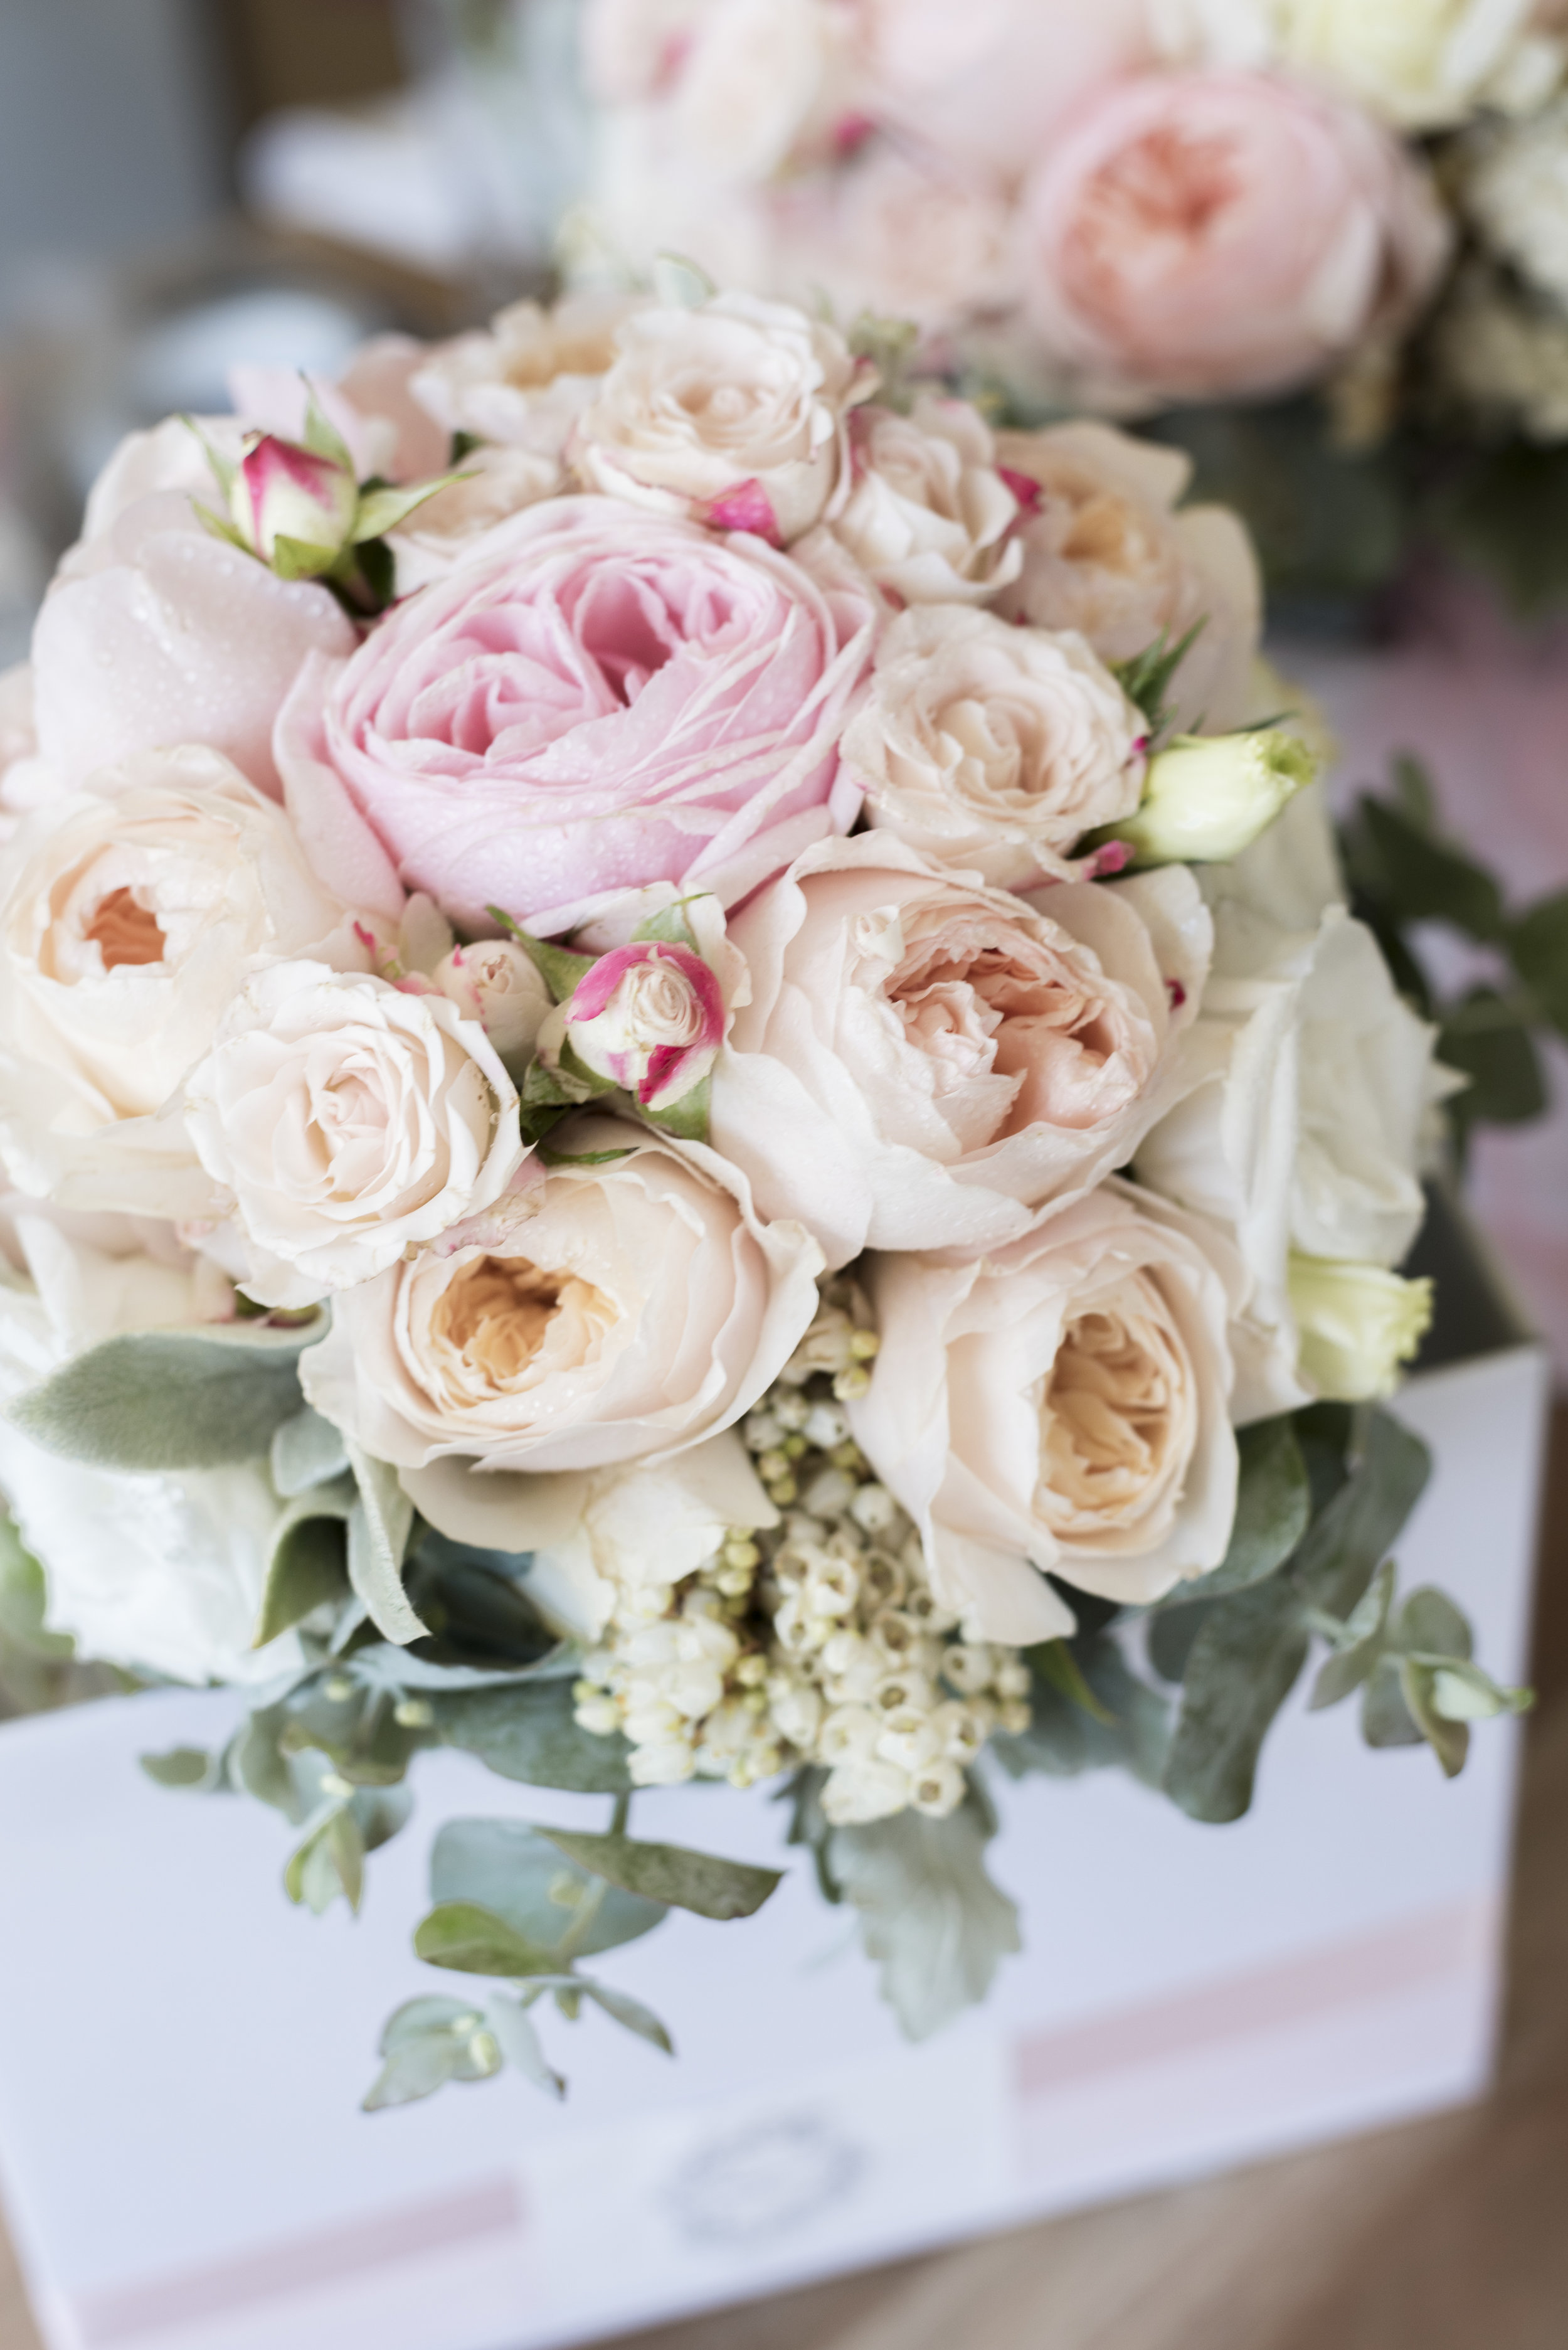 Teagan_Mayflower Weddings Photography_002.jpg